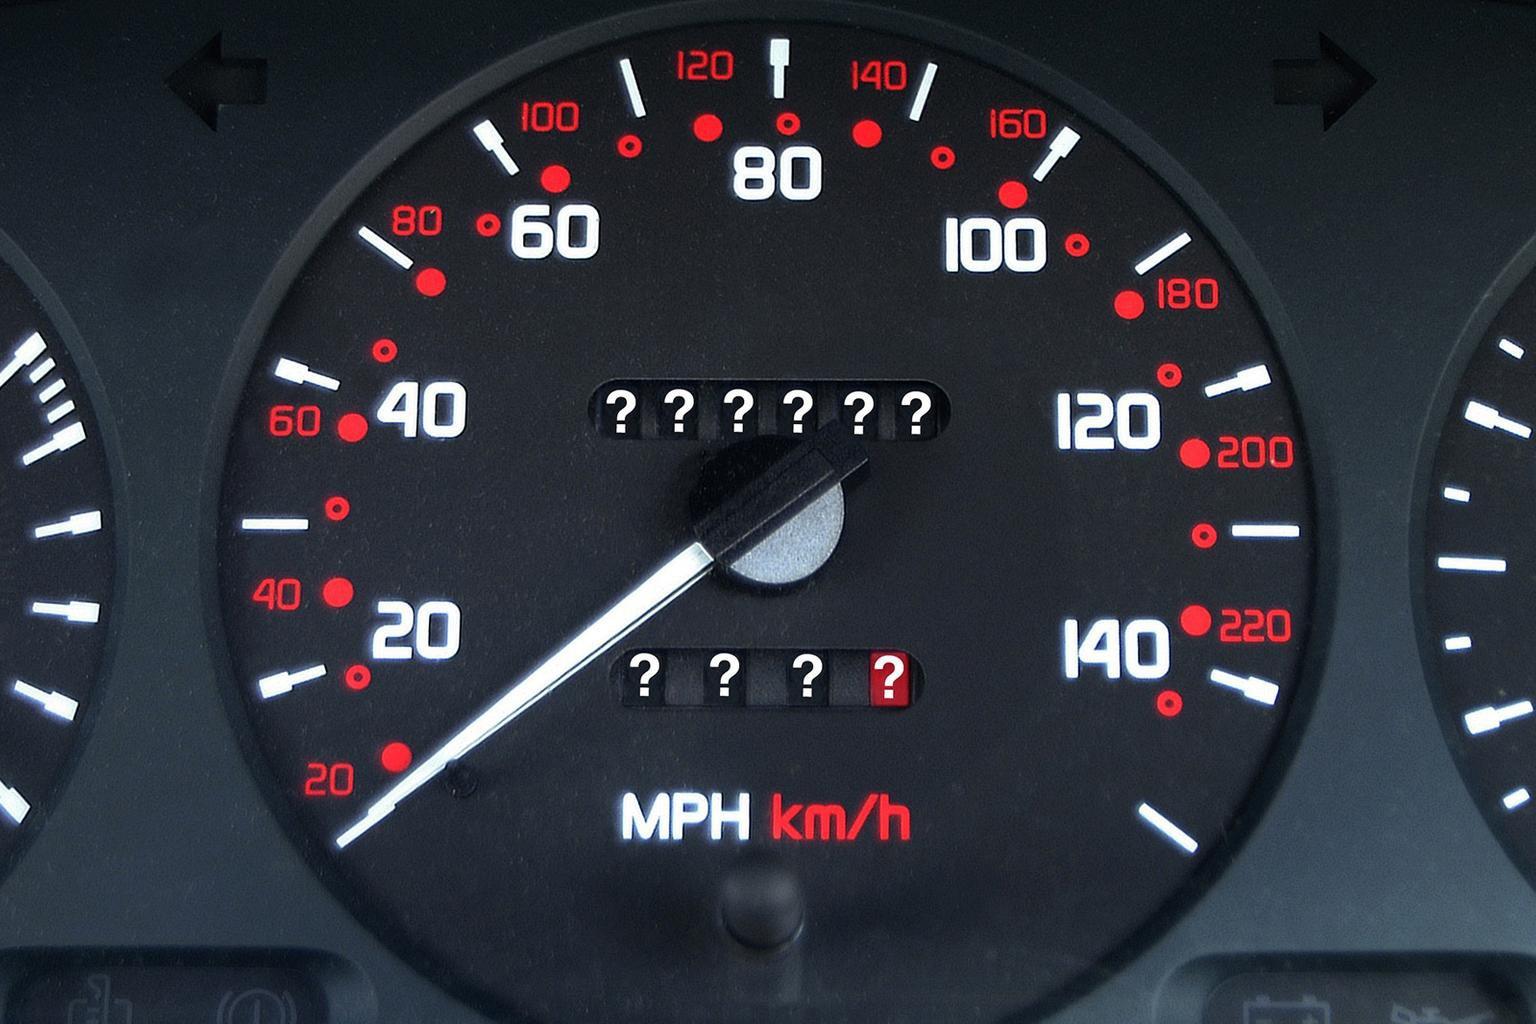 6. Keep checking the odometer